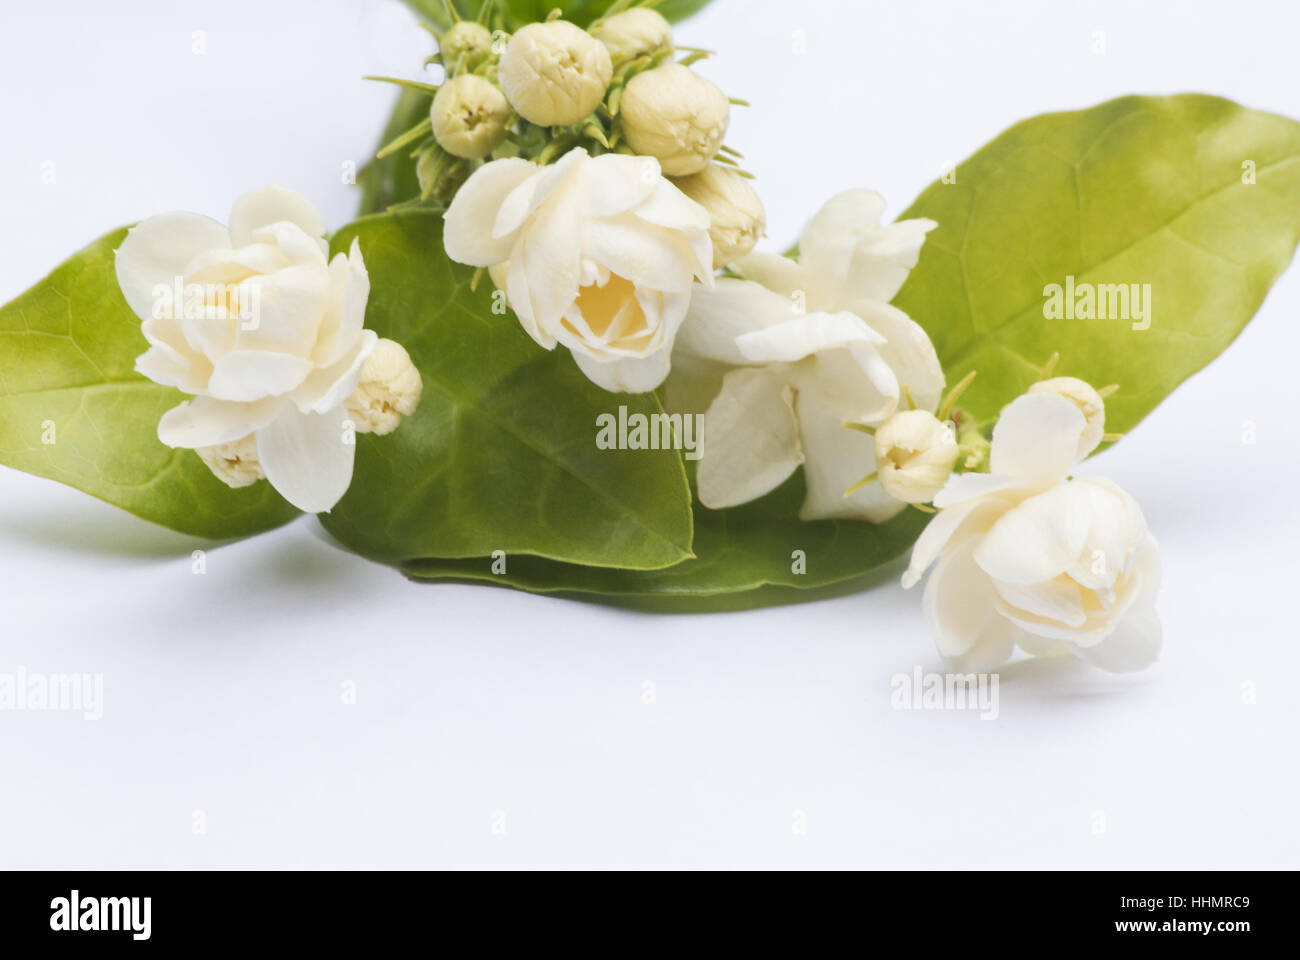 Jasmine flowers arabian jasmine jasminum sambac on white jasmine flowers arabian jasmine jasminum sambac on white background izmirmasajfo